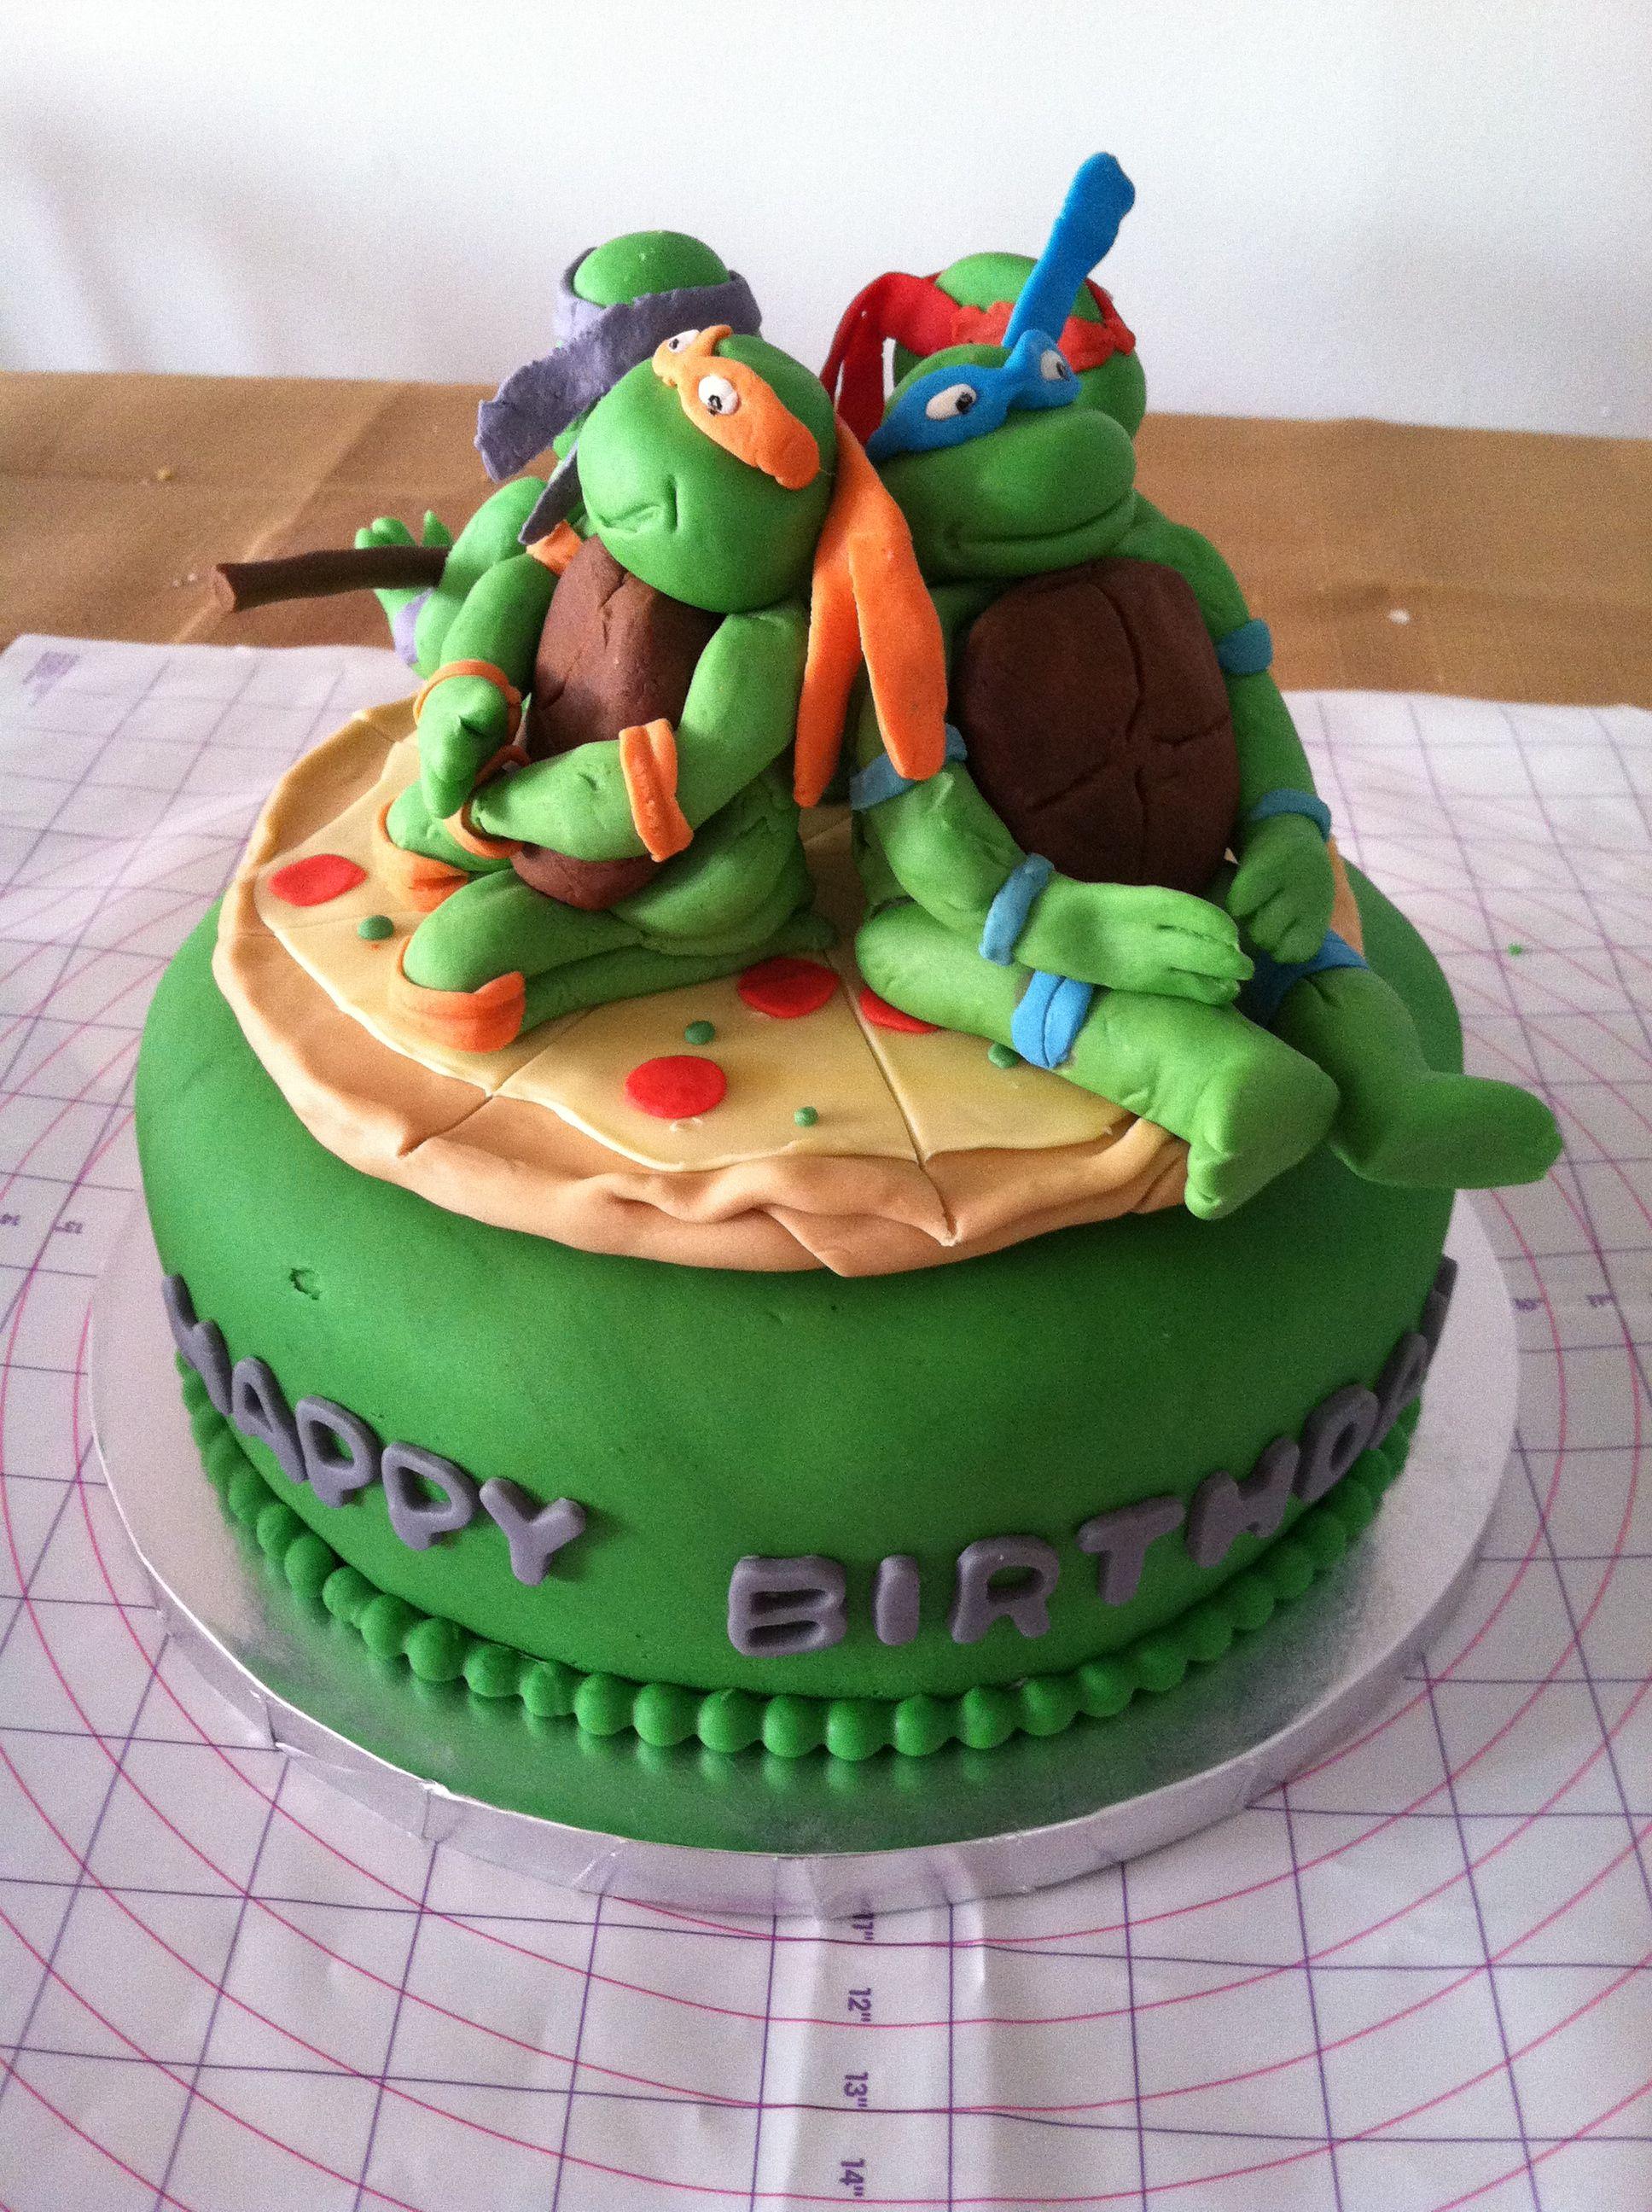 Ninja Turtles cake | Cakes I've made =) | Pinterest ...